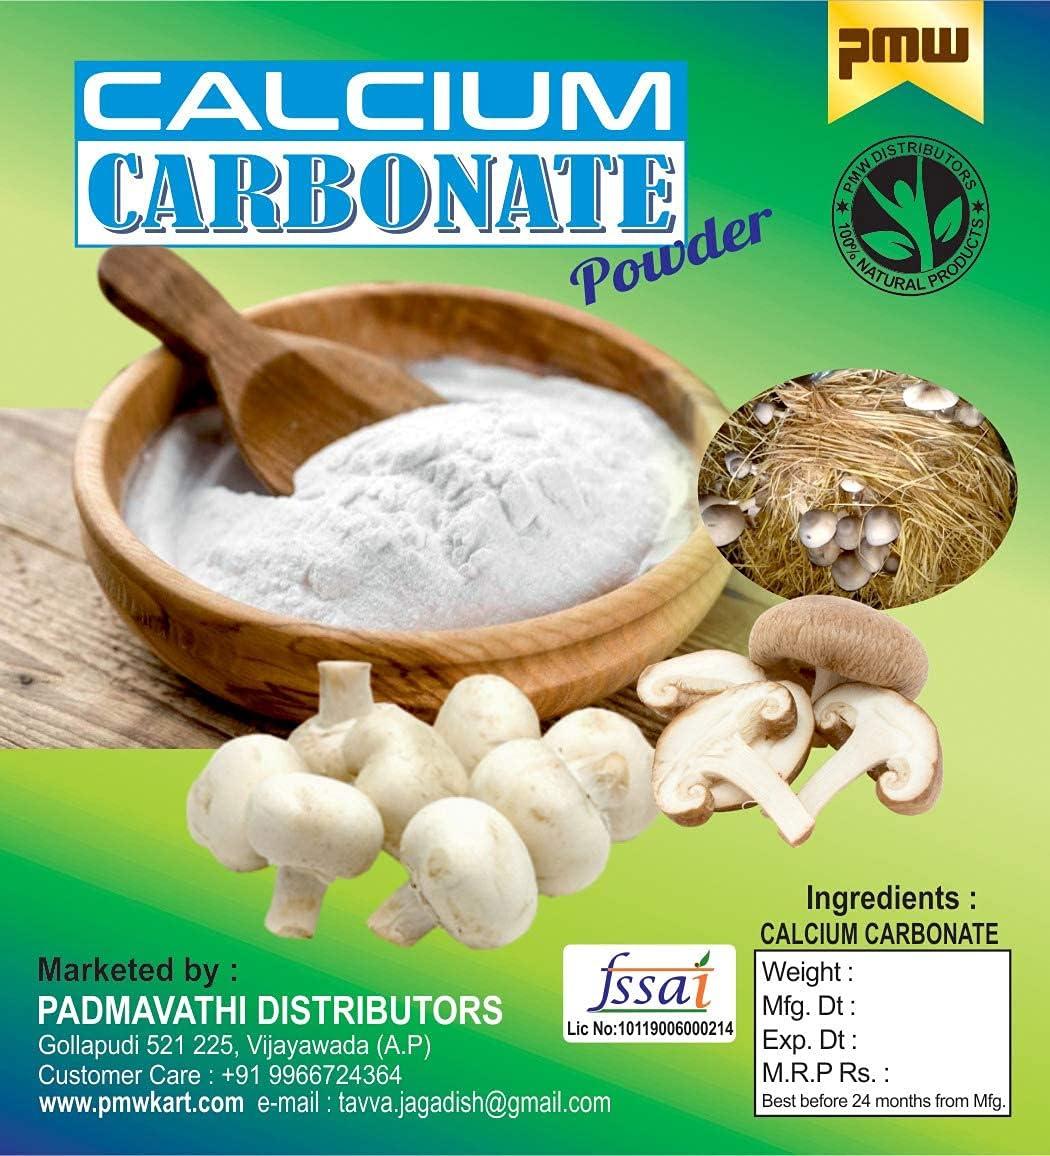 Shivay Pmw - Calcium Washington Mall Carbonate Kilo Save money Cultivation for 1 Mushroom